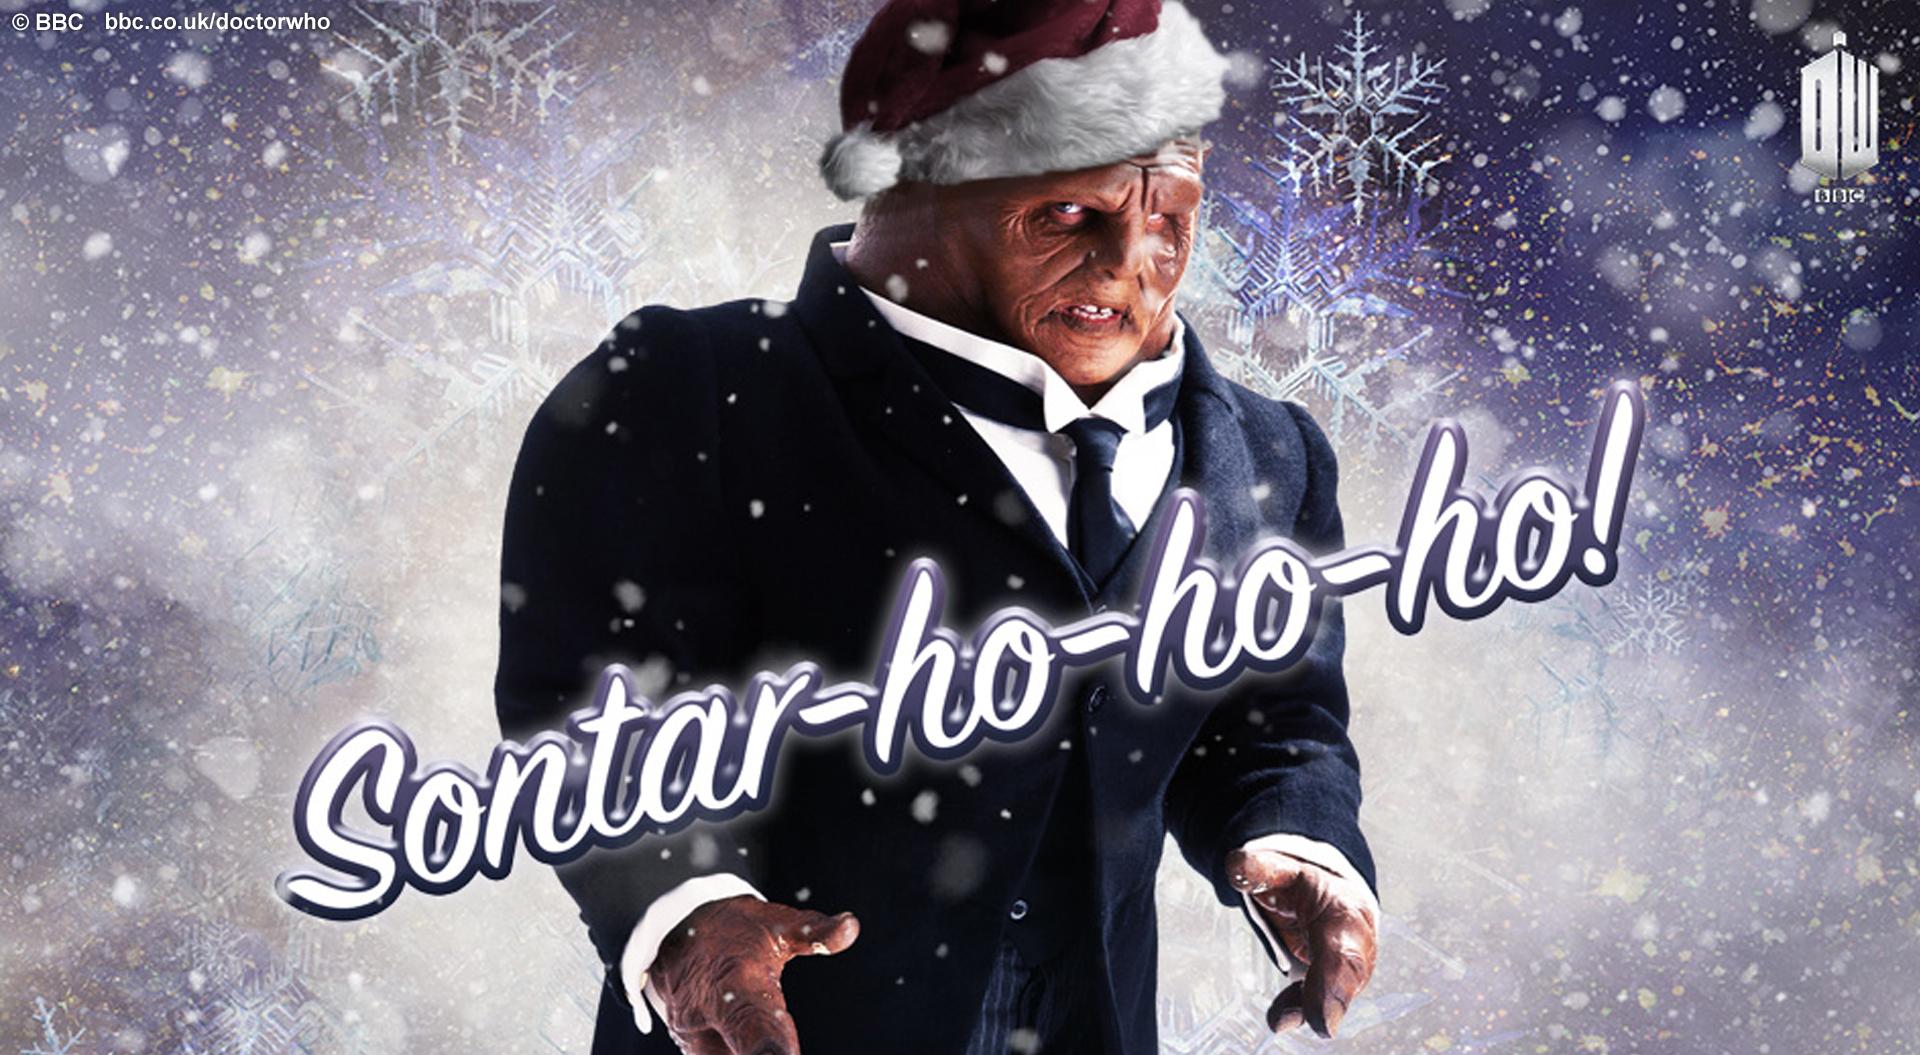 Doctor Who Christmas Cards.Bbc Latest News Doctor Who Beautiful Doctor Who Christmas Cards